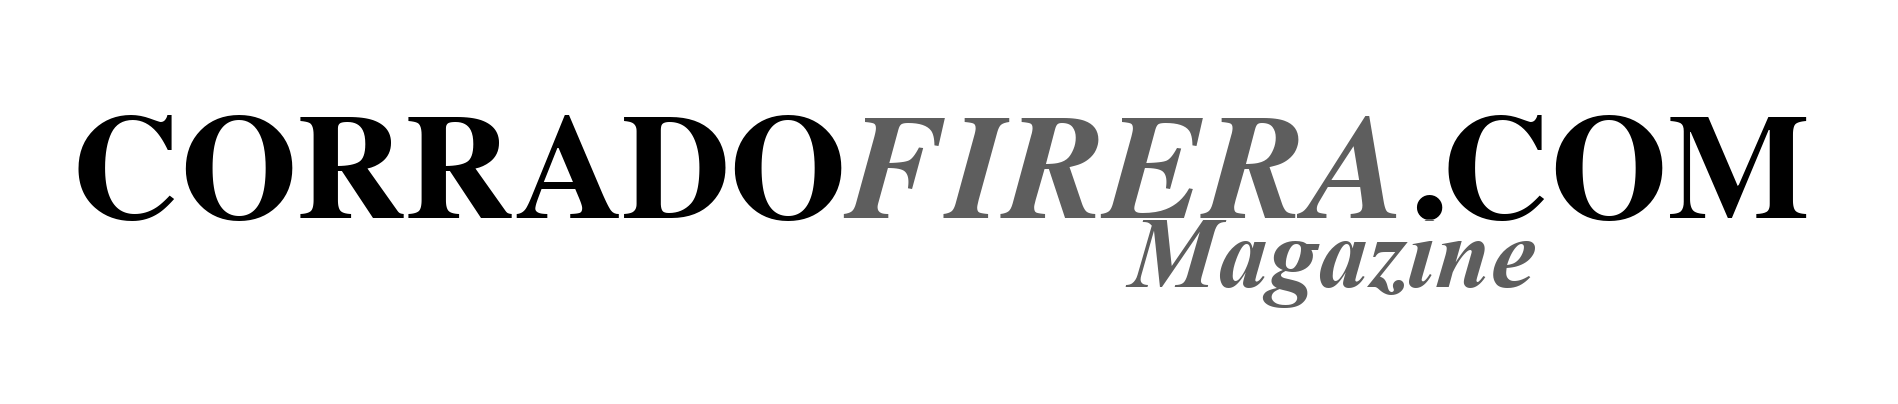 Corrado Firera's Magazine